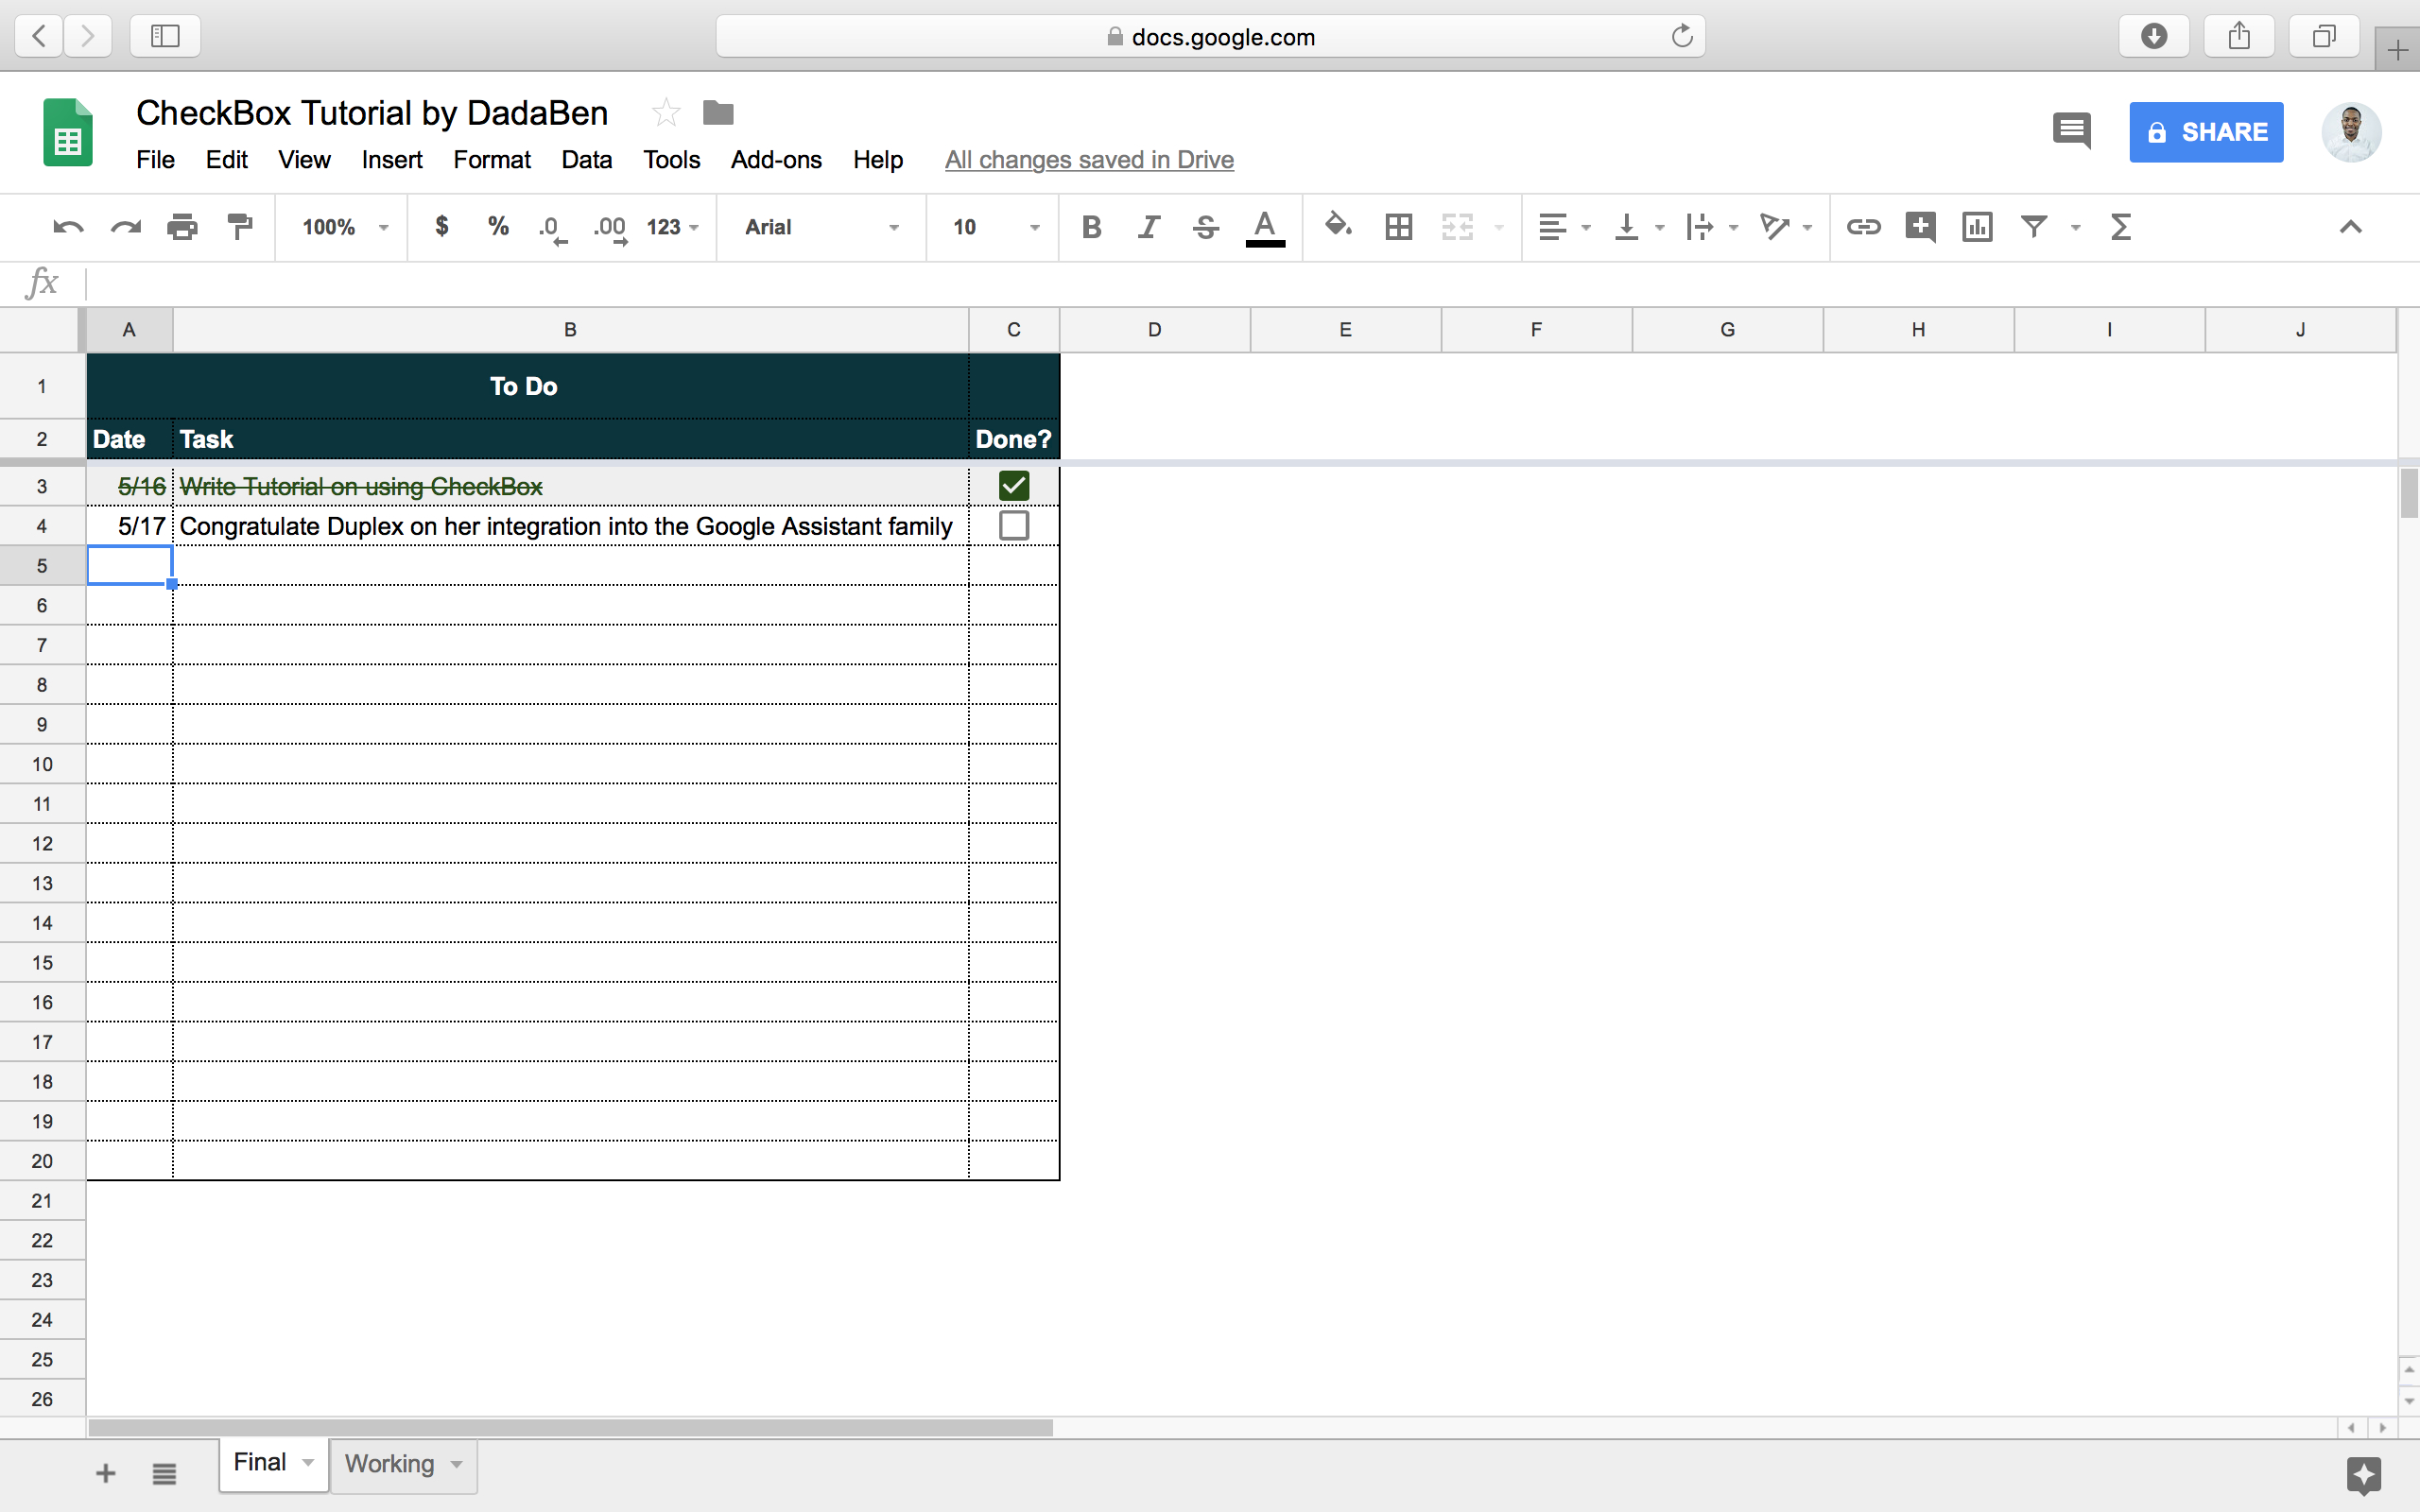 Marketing Spreadsheet Marketing Spreadsheet Template Sample Marketing Budget Spreadsheet